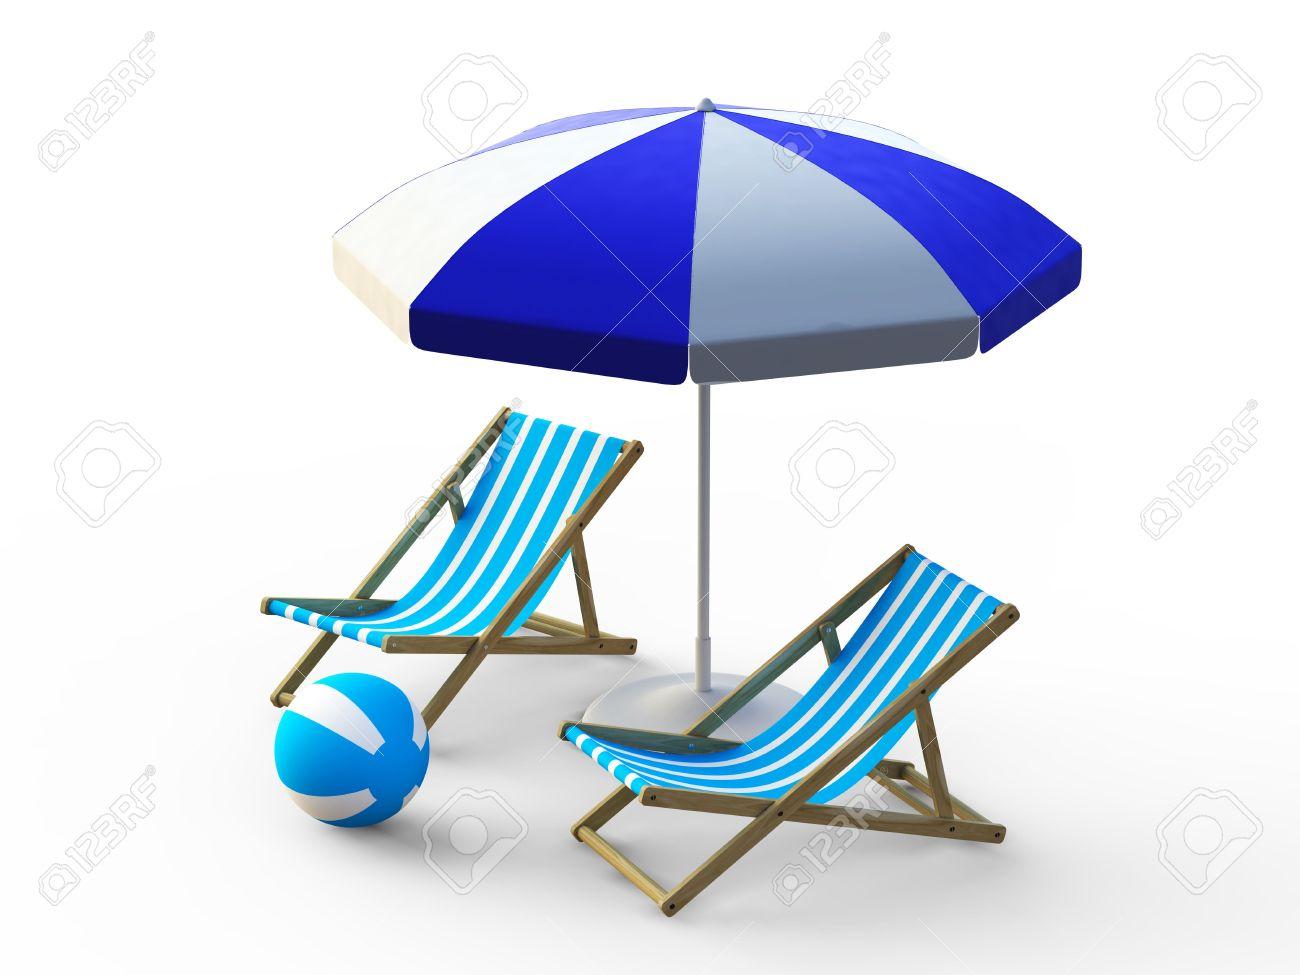 Beach umbrella and chair black and white - Blue Beach Chair And Umbrella On White Background Stock Photo 7292600